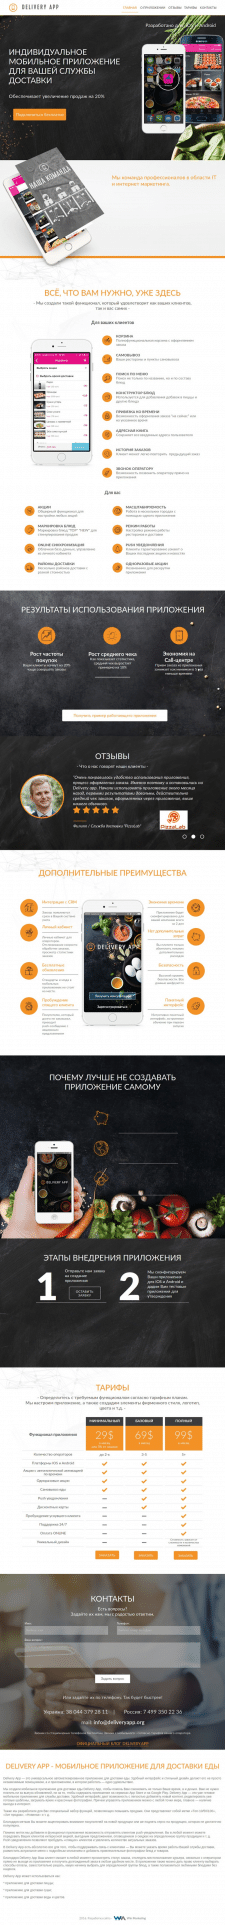 DeliveryApp